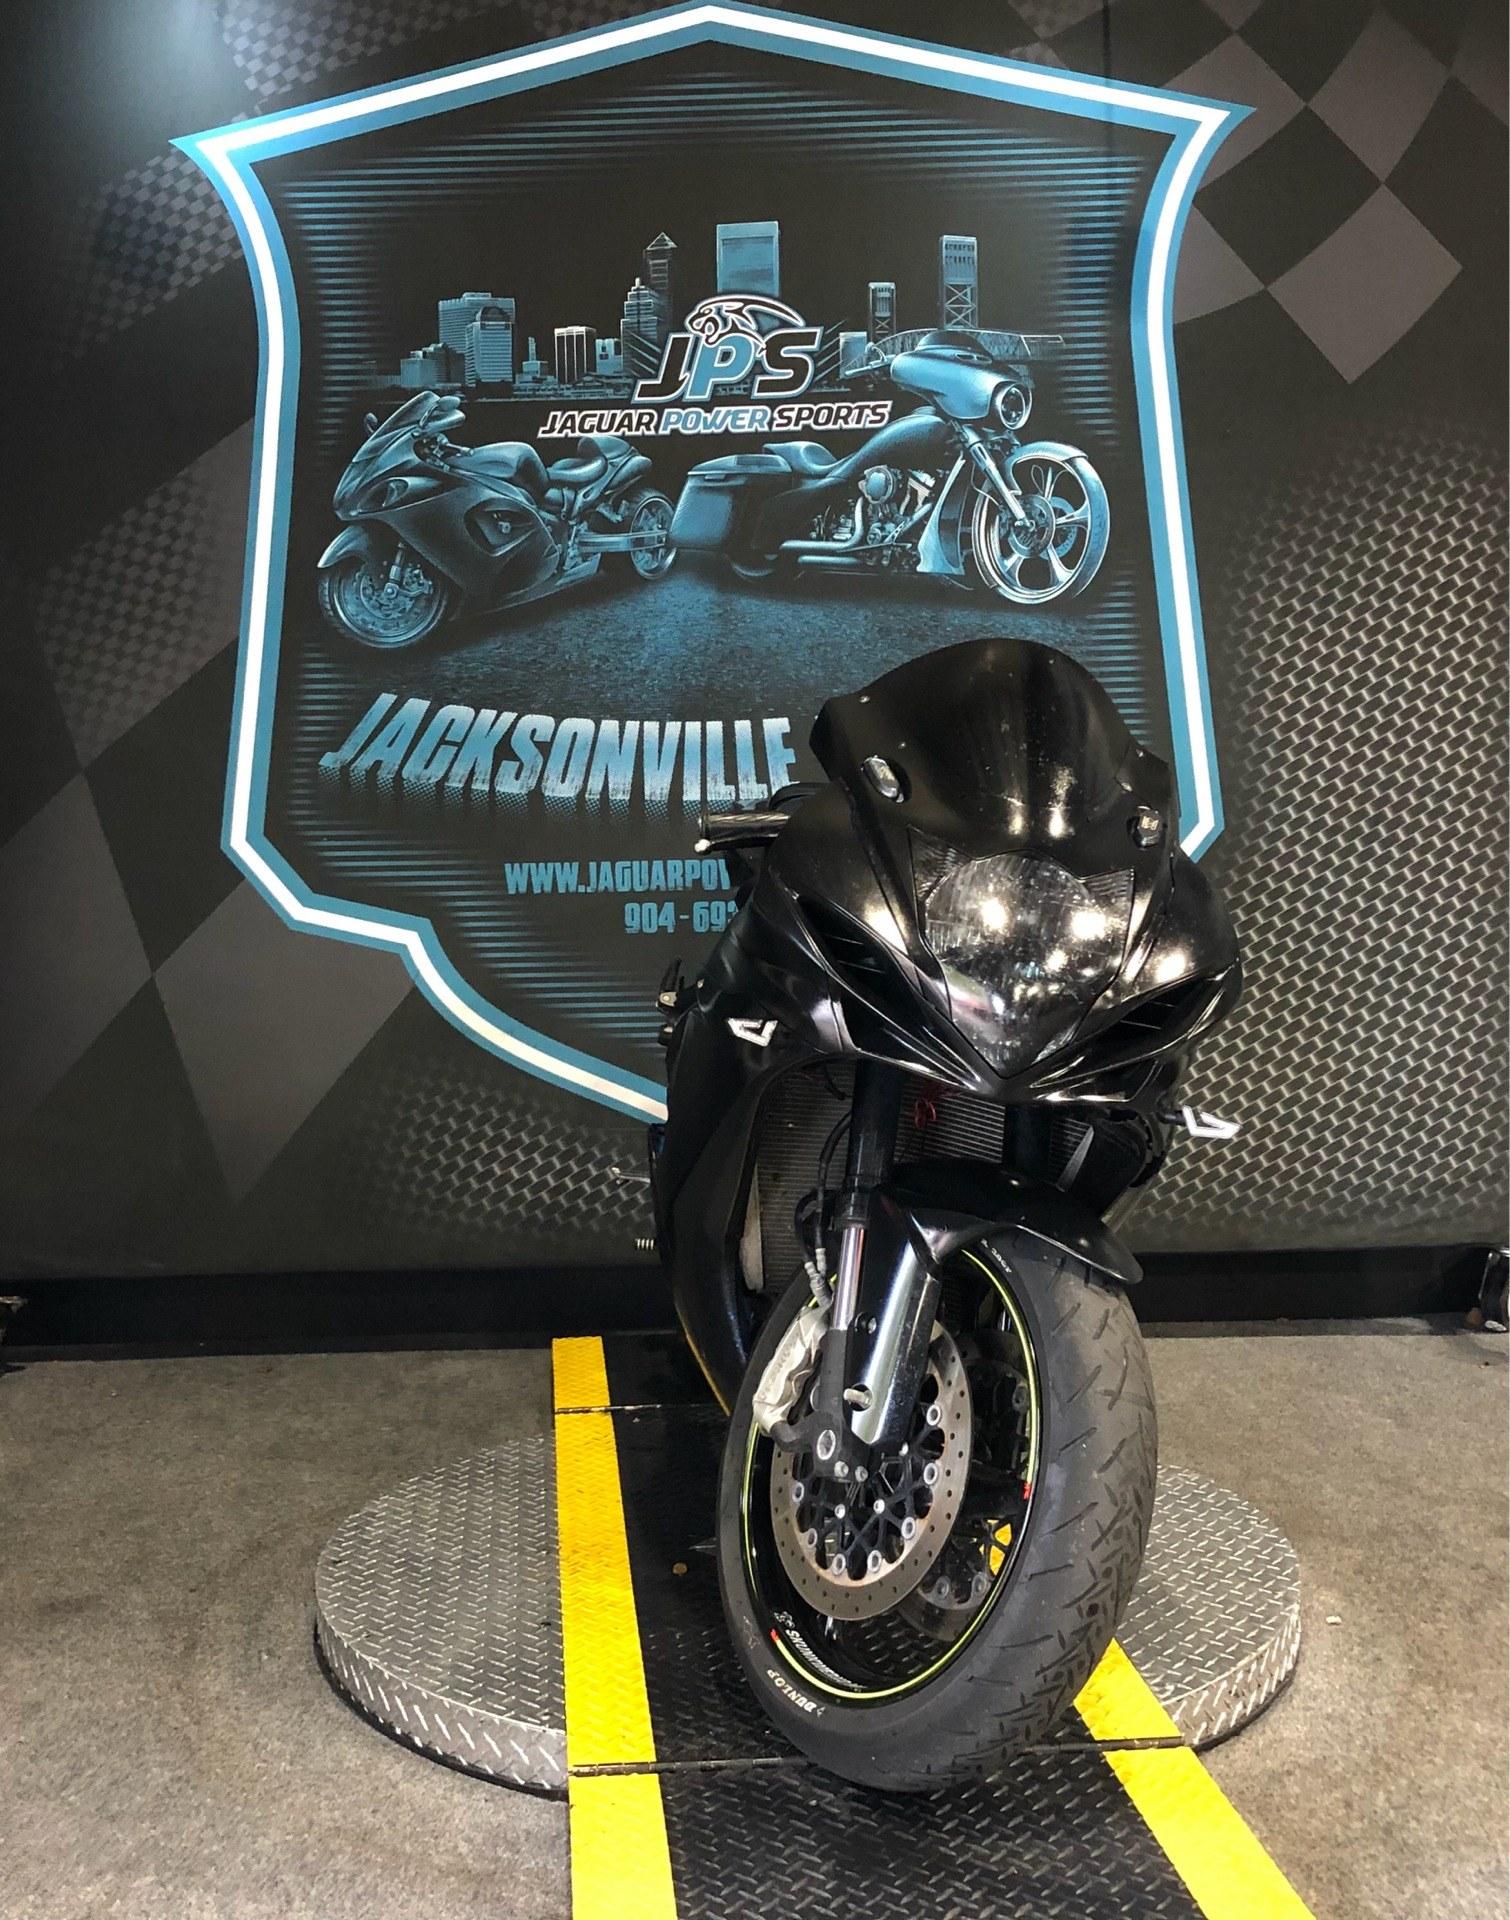 used 2015 suzuki gsx r600 motorcycles in jacksonville fl stock number suz100608. Black Bedroom Furniture Sets. Home Design Ideas